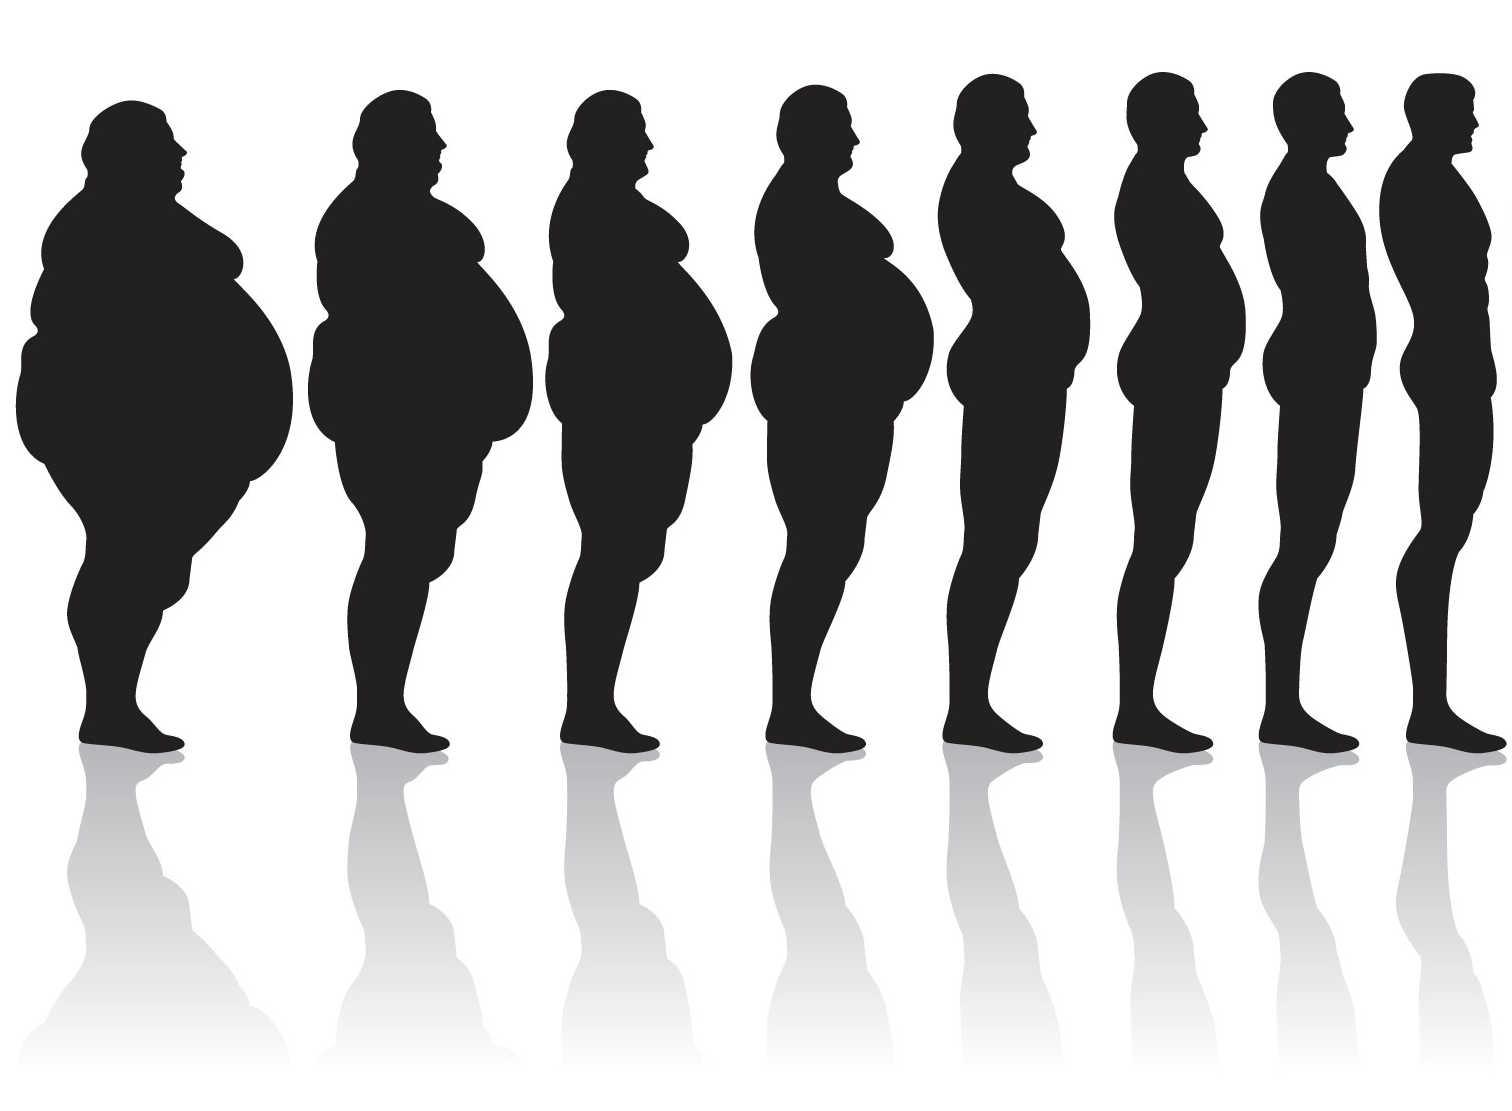 Fat+to+Skinny+Clip+Art Walking with Walker Lady: He Look-a Like-a Man!